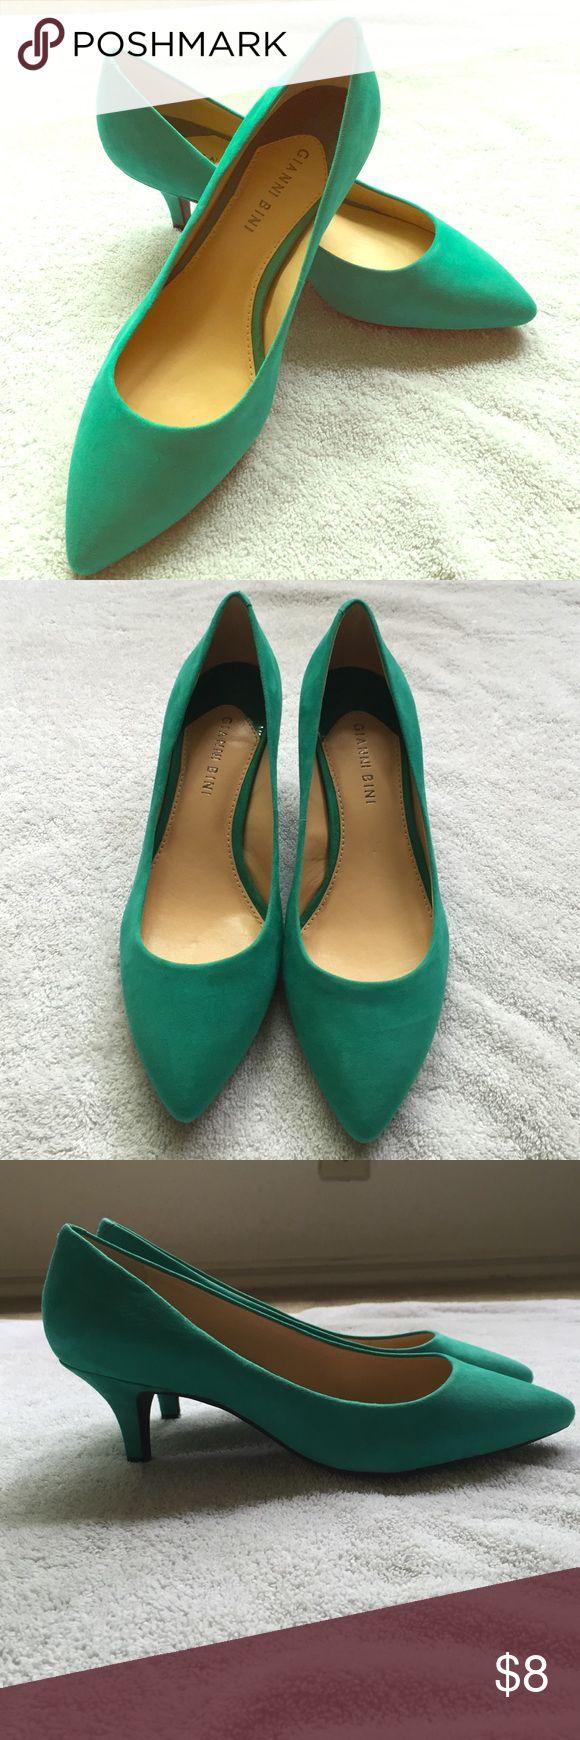 Gianni Bini kitten heels Gianni Bini teal kitten heals size 8. Never worn. Gianni Bini Shoes Heels